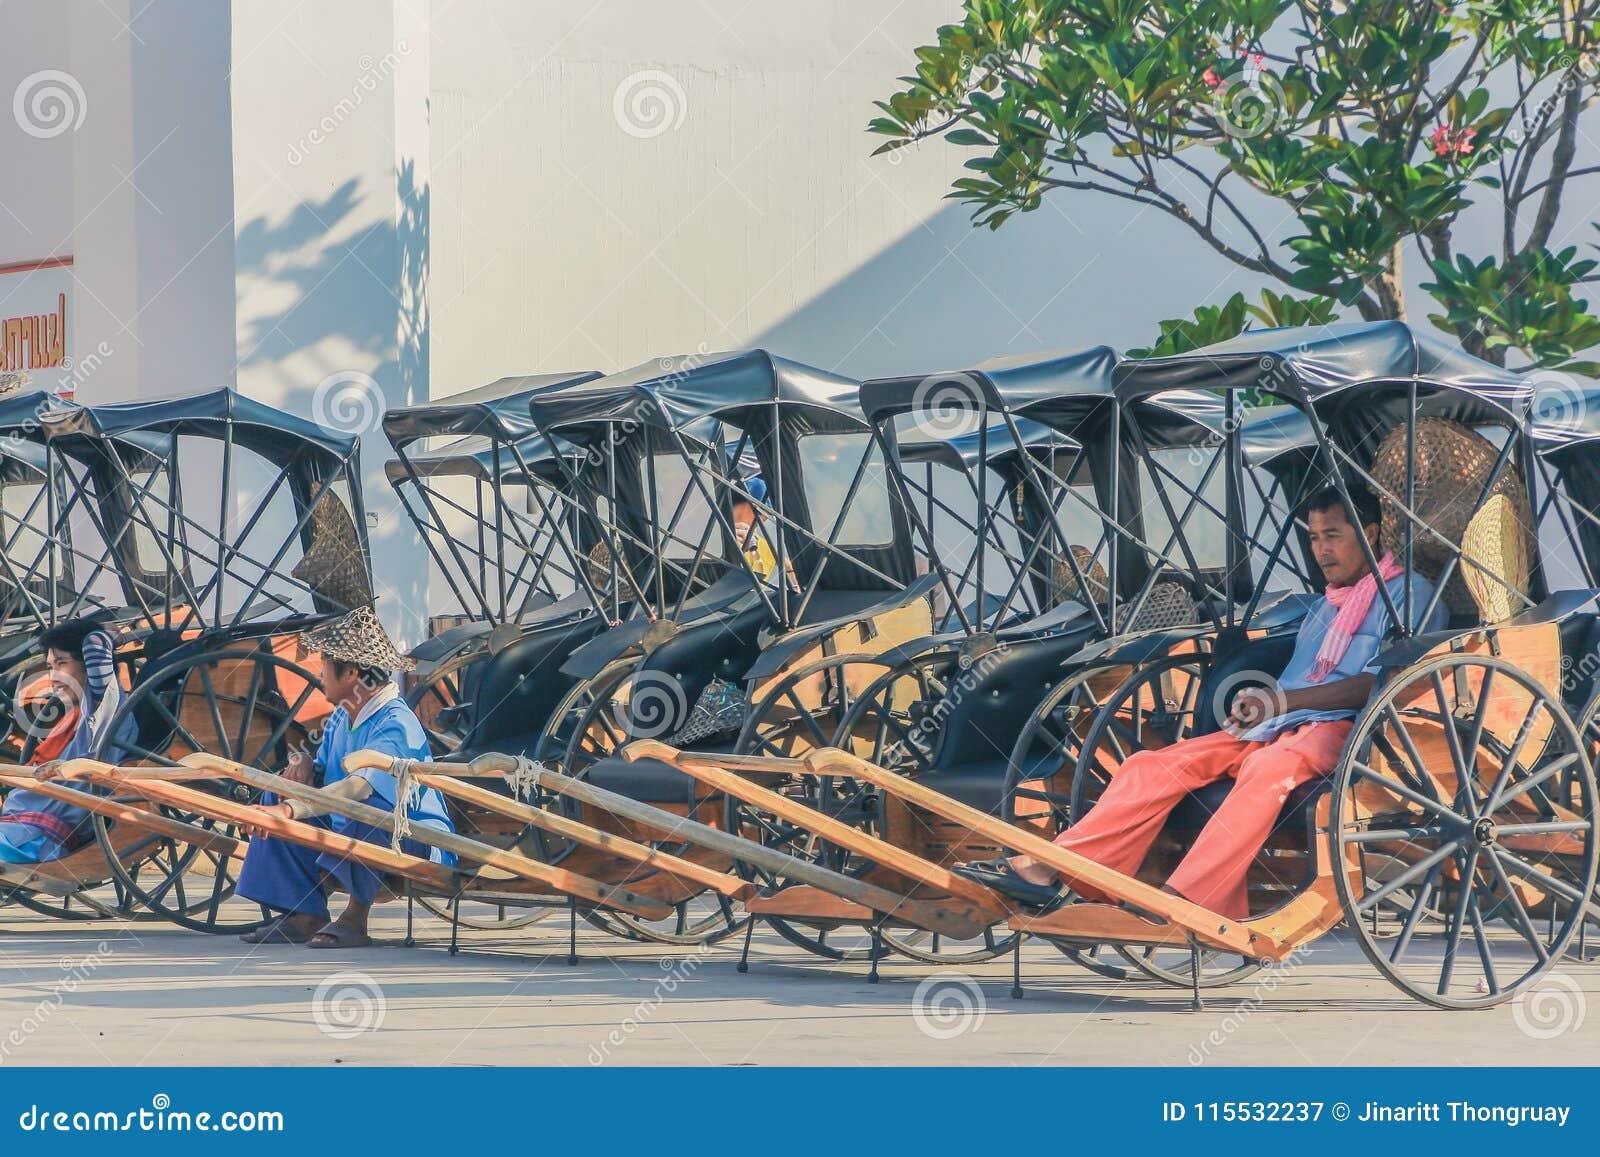 KANCHANABURI,THAILAND-DECEMBER 10 : Old wooden carts Waiting for